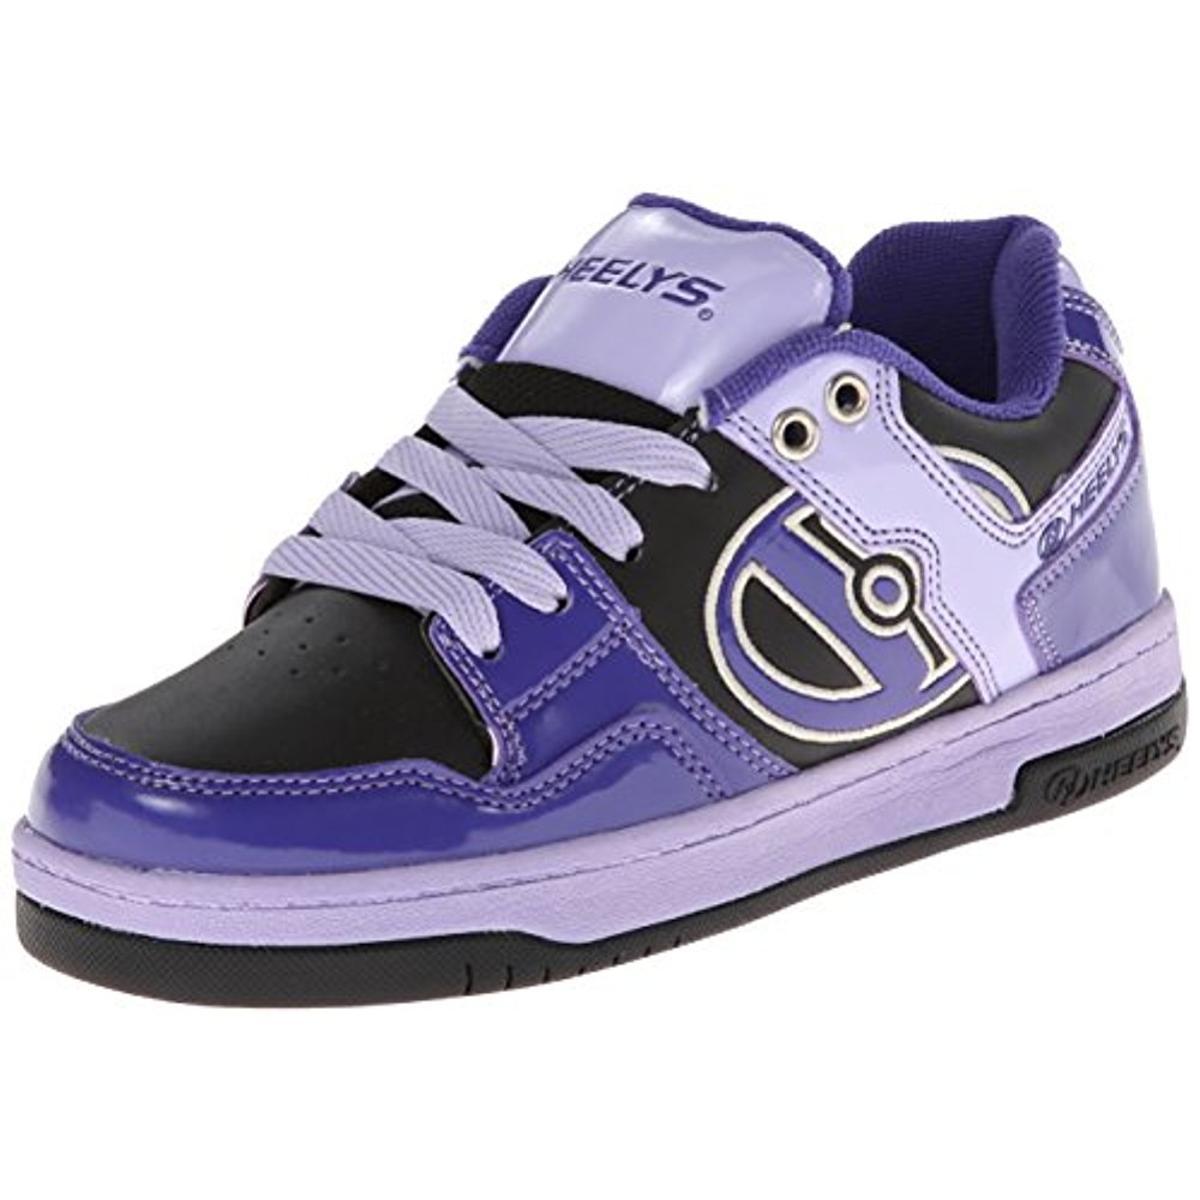 Heelys Girls Flow Skater Little Kid Sneakers